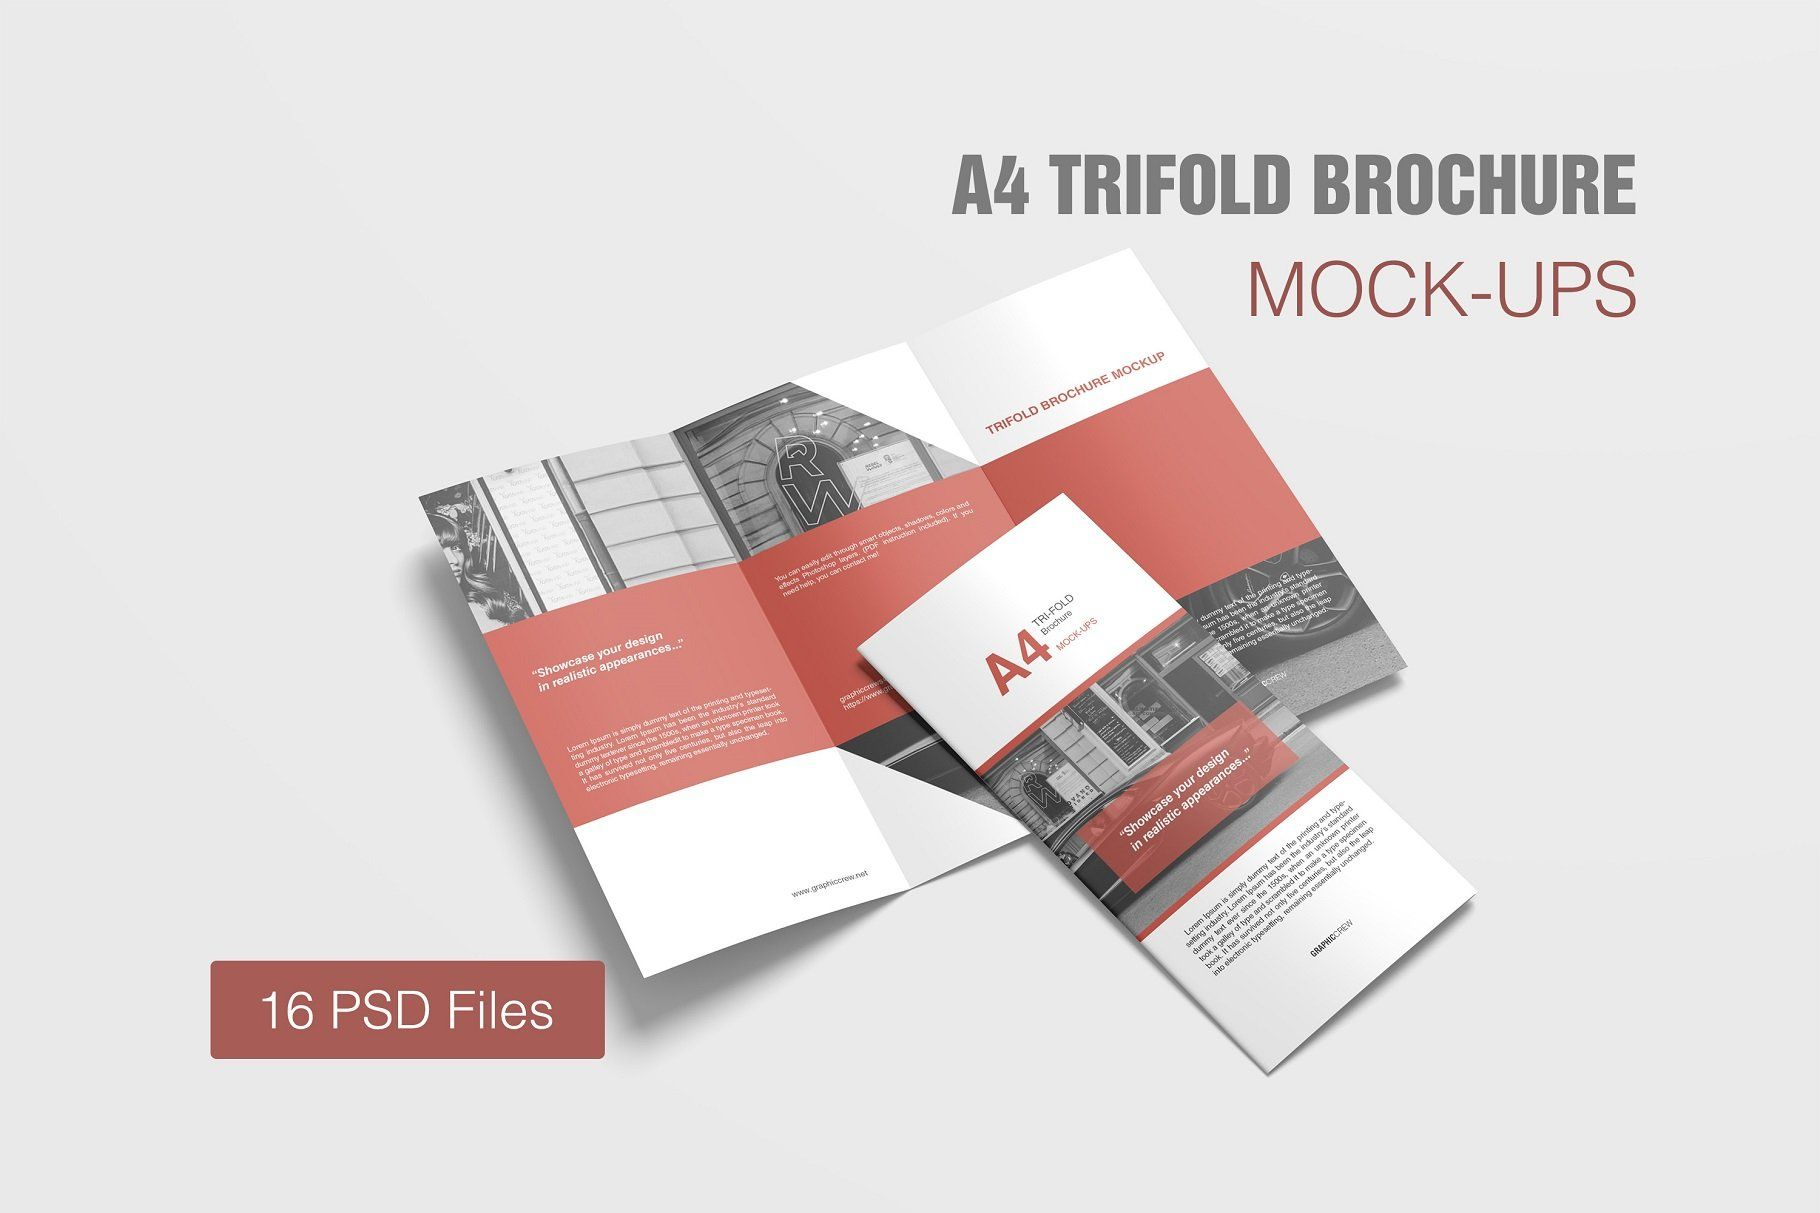 A4 Trifold Brochure Mockup Brochure Mockup Psd Design Mockup Free Trifold Brochure